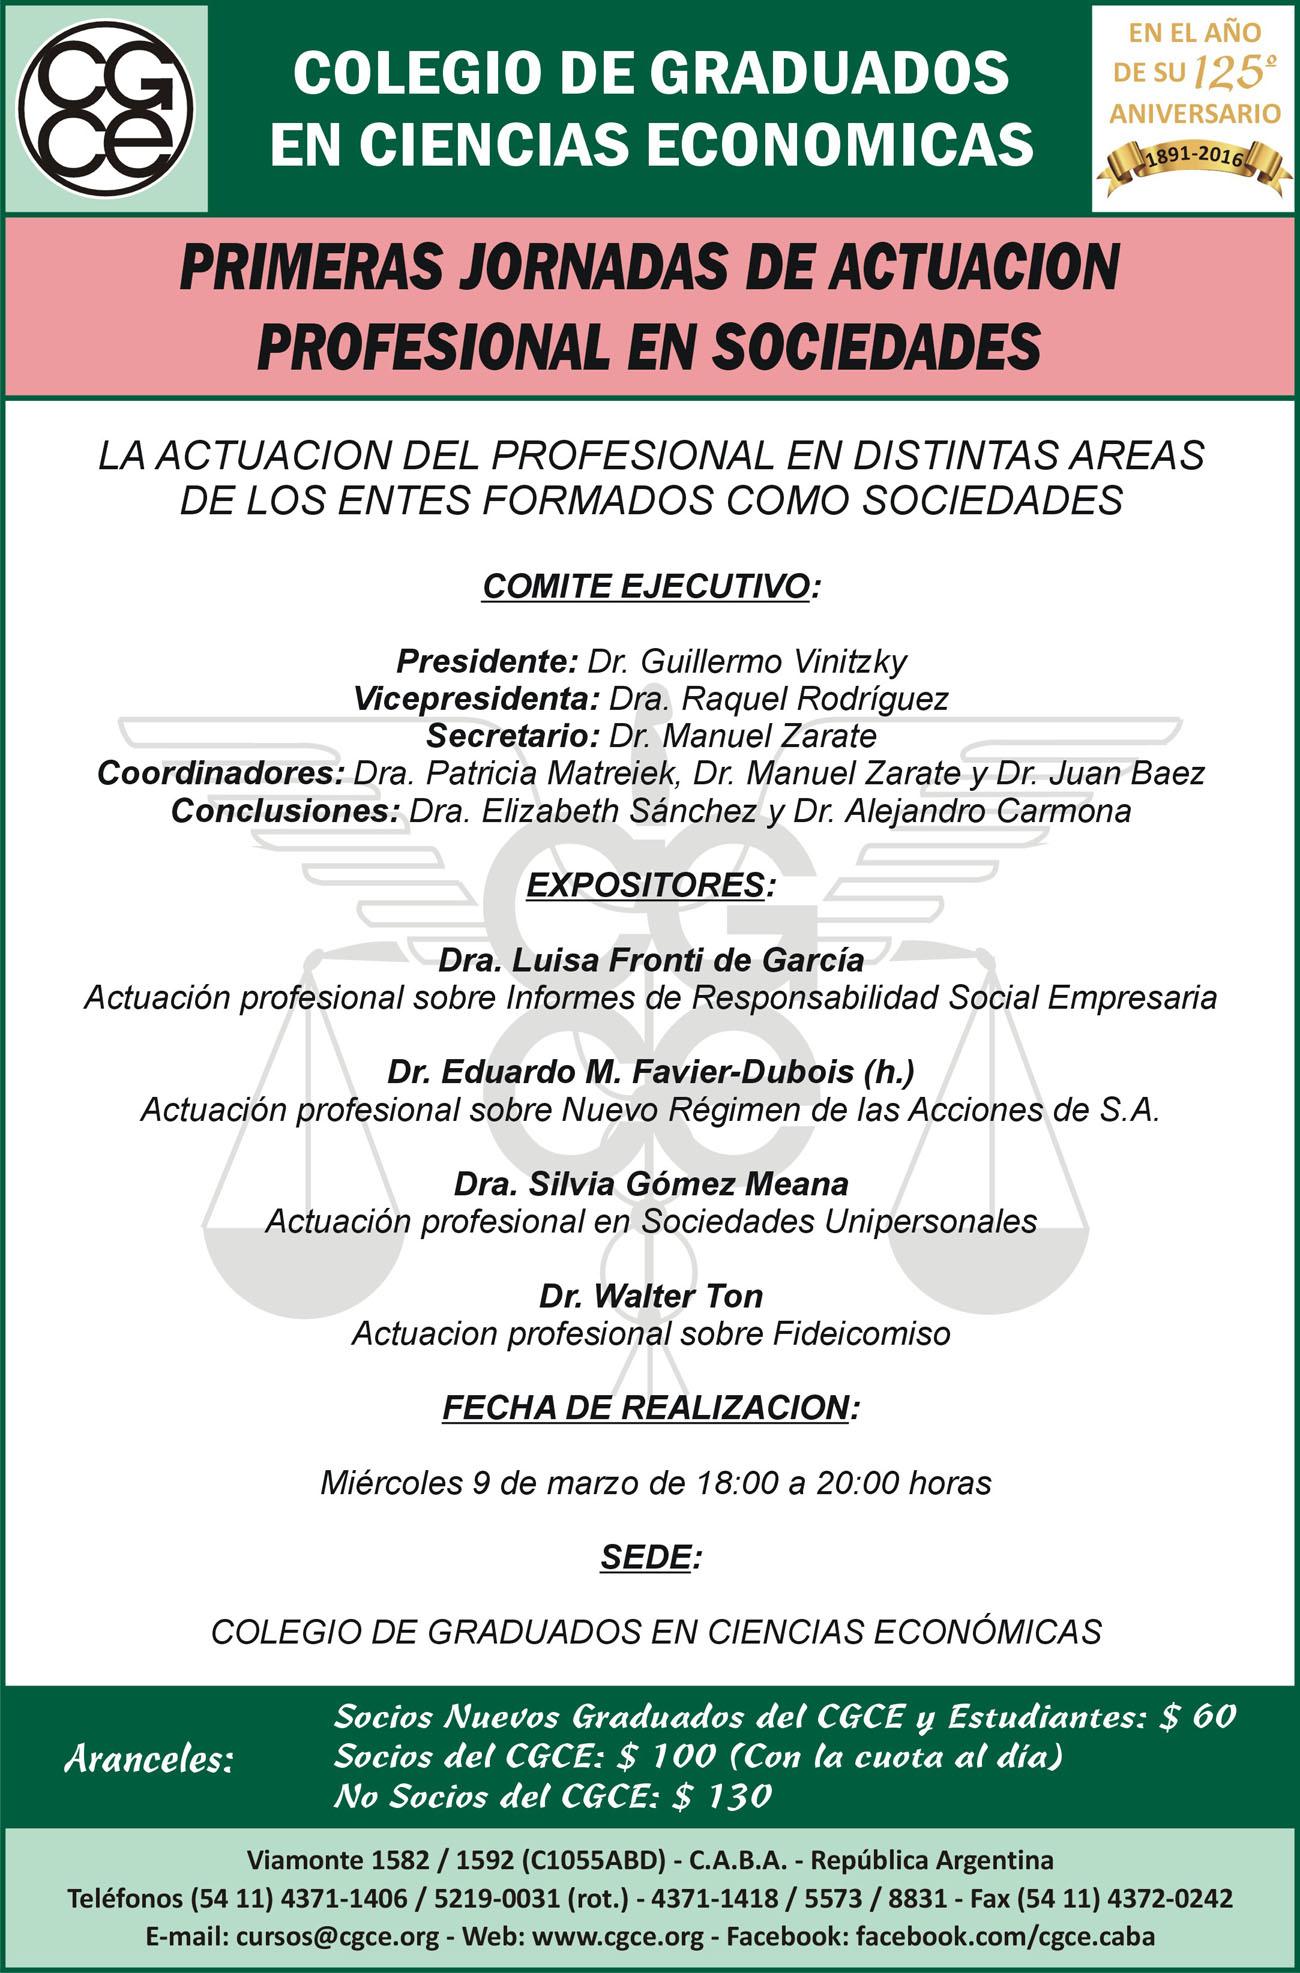 Afiche_Jornadas_de_Actuación_Profesional_en_Sociedades